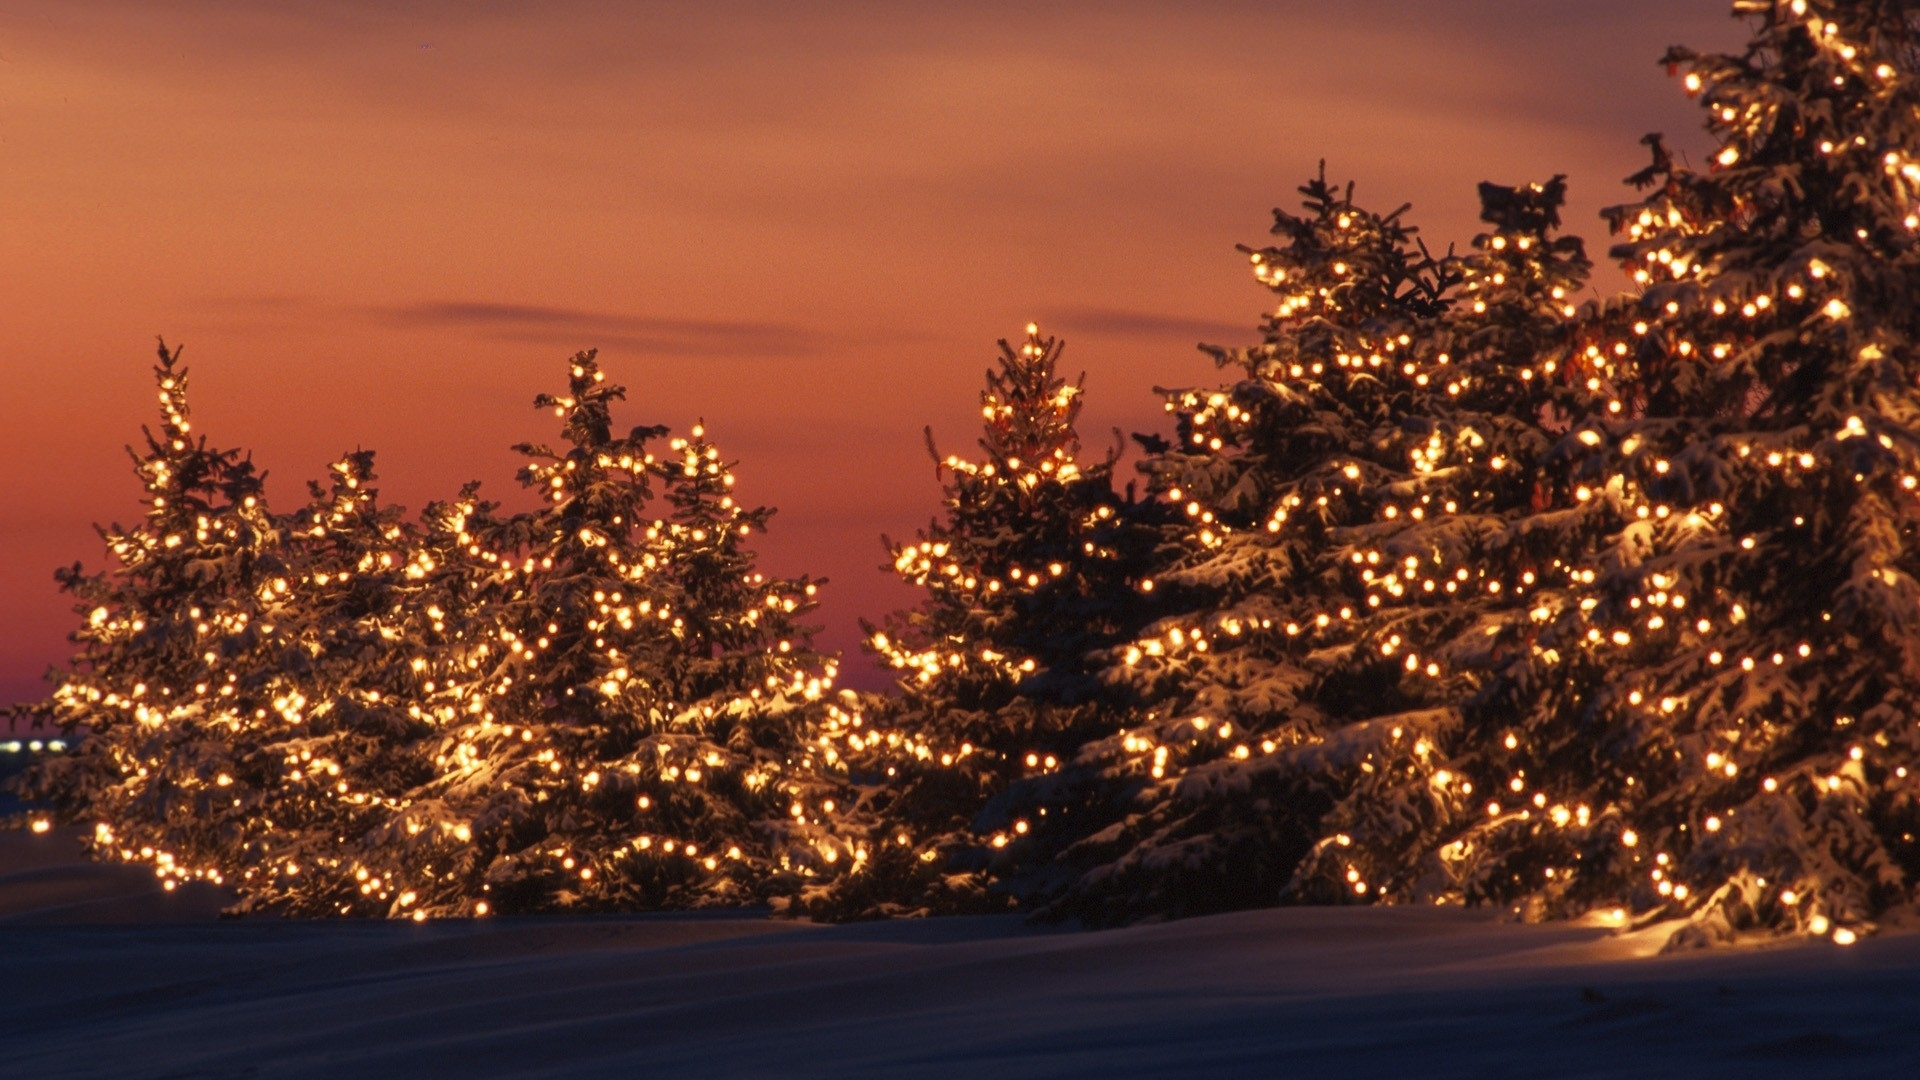 Christmas Lights Aesthetic Vintage Christmas Desktop Wallpaper